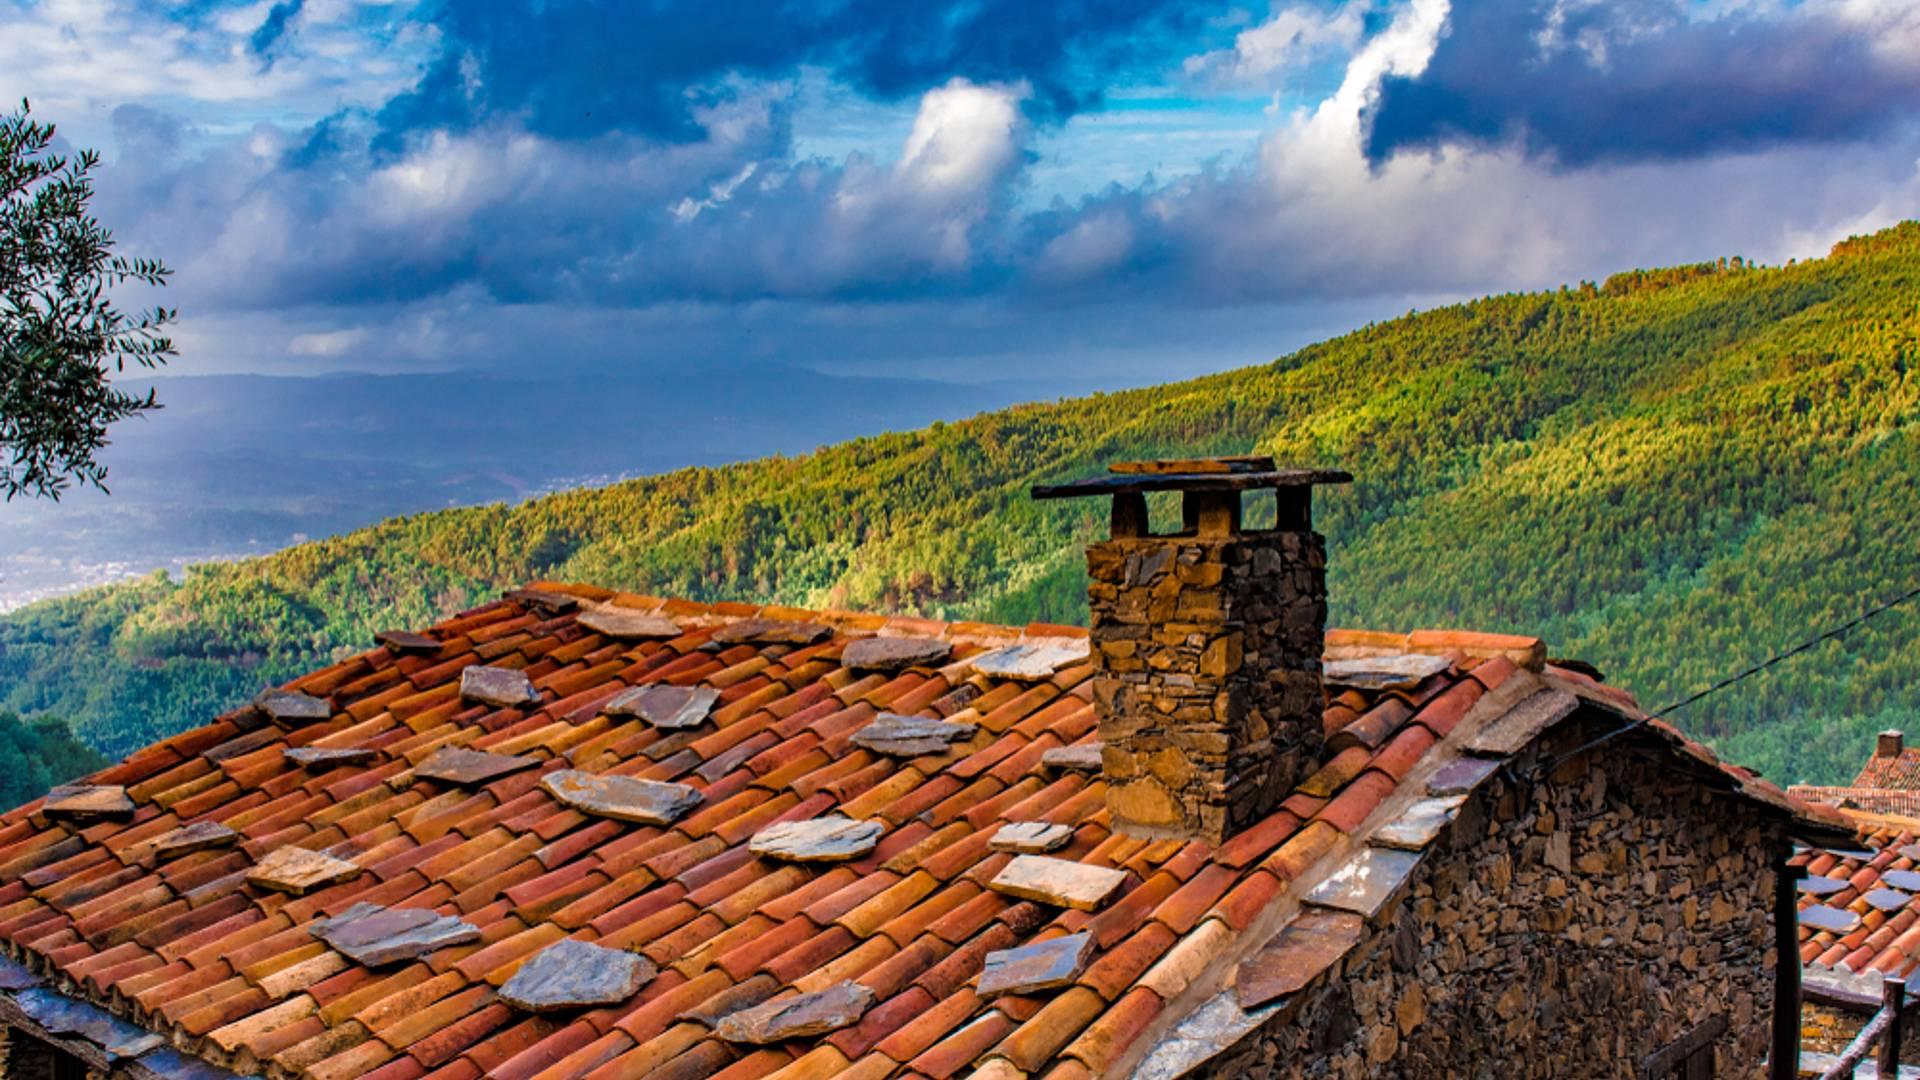 Serra da Lousã, de centrale vallei van Portugal